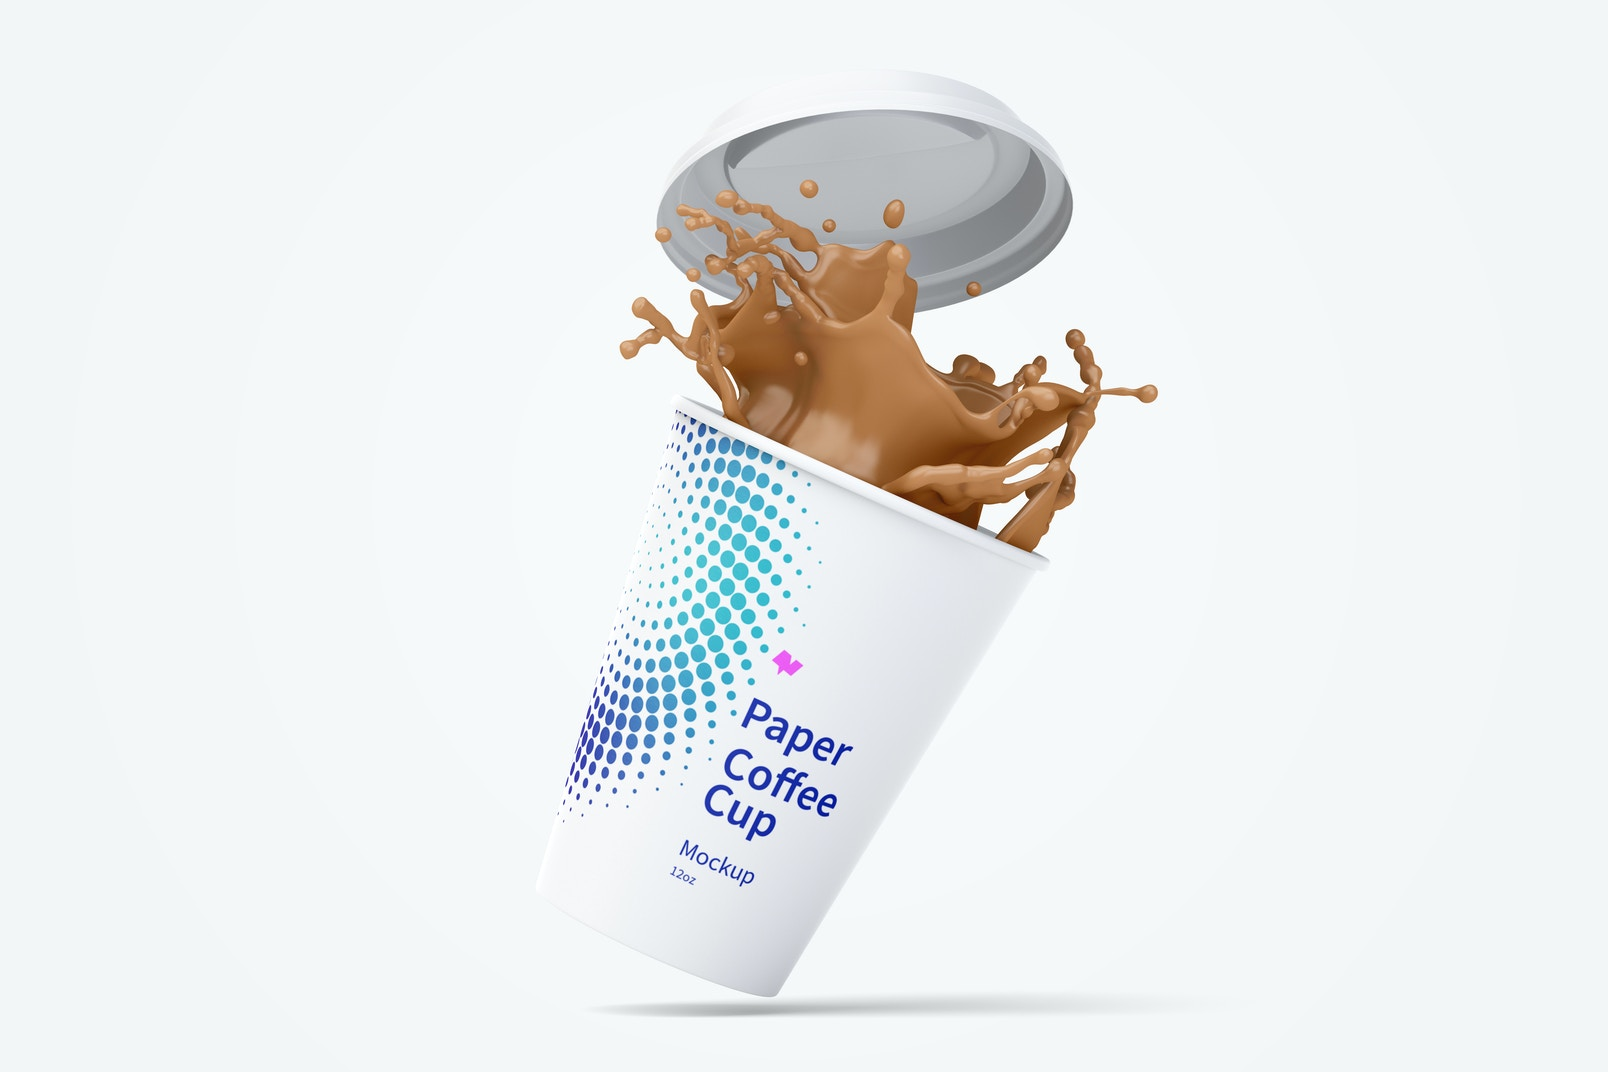 12oz Paper Coffee Cup Mockup with Splash